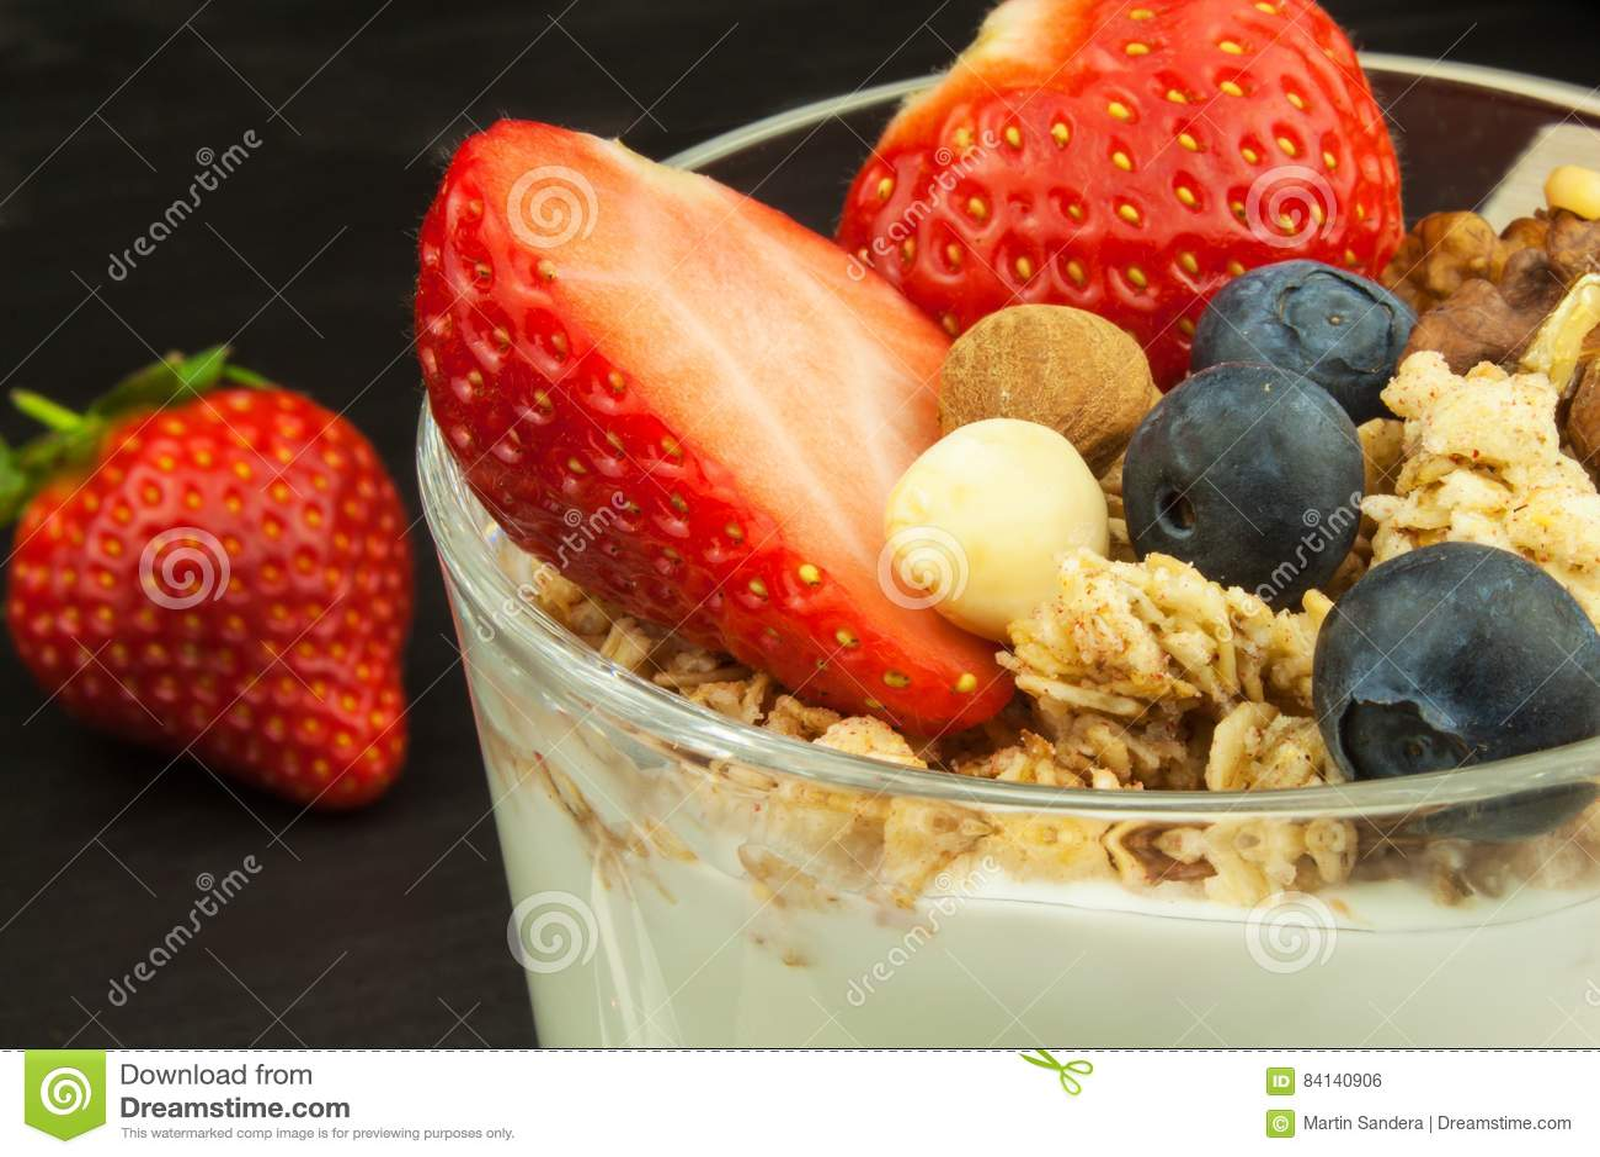 dieta di farina davena e yogurt